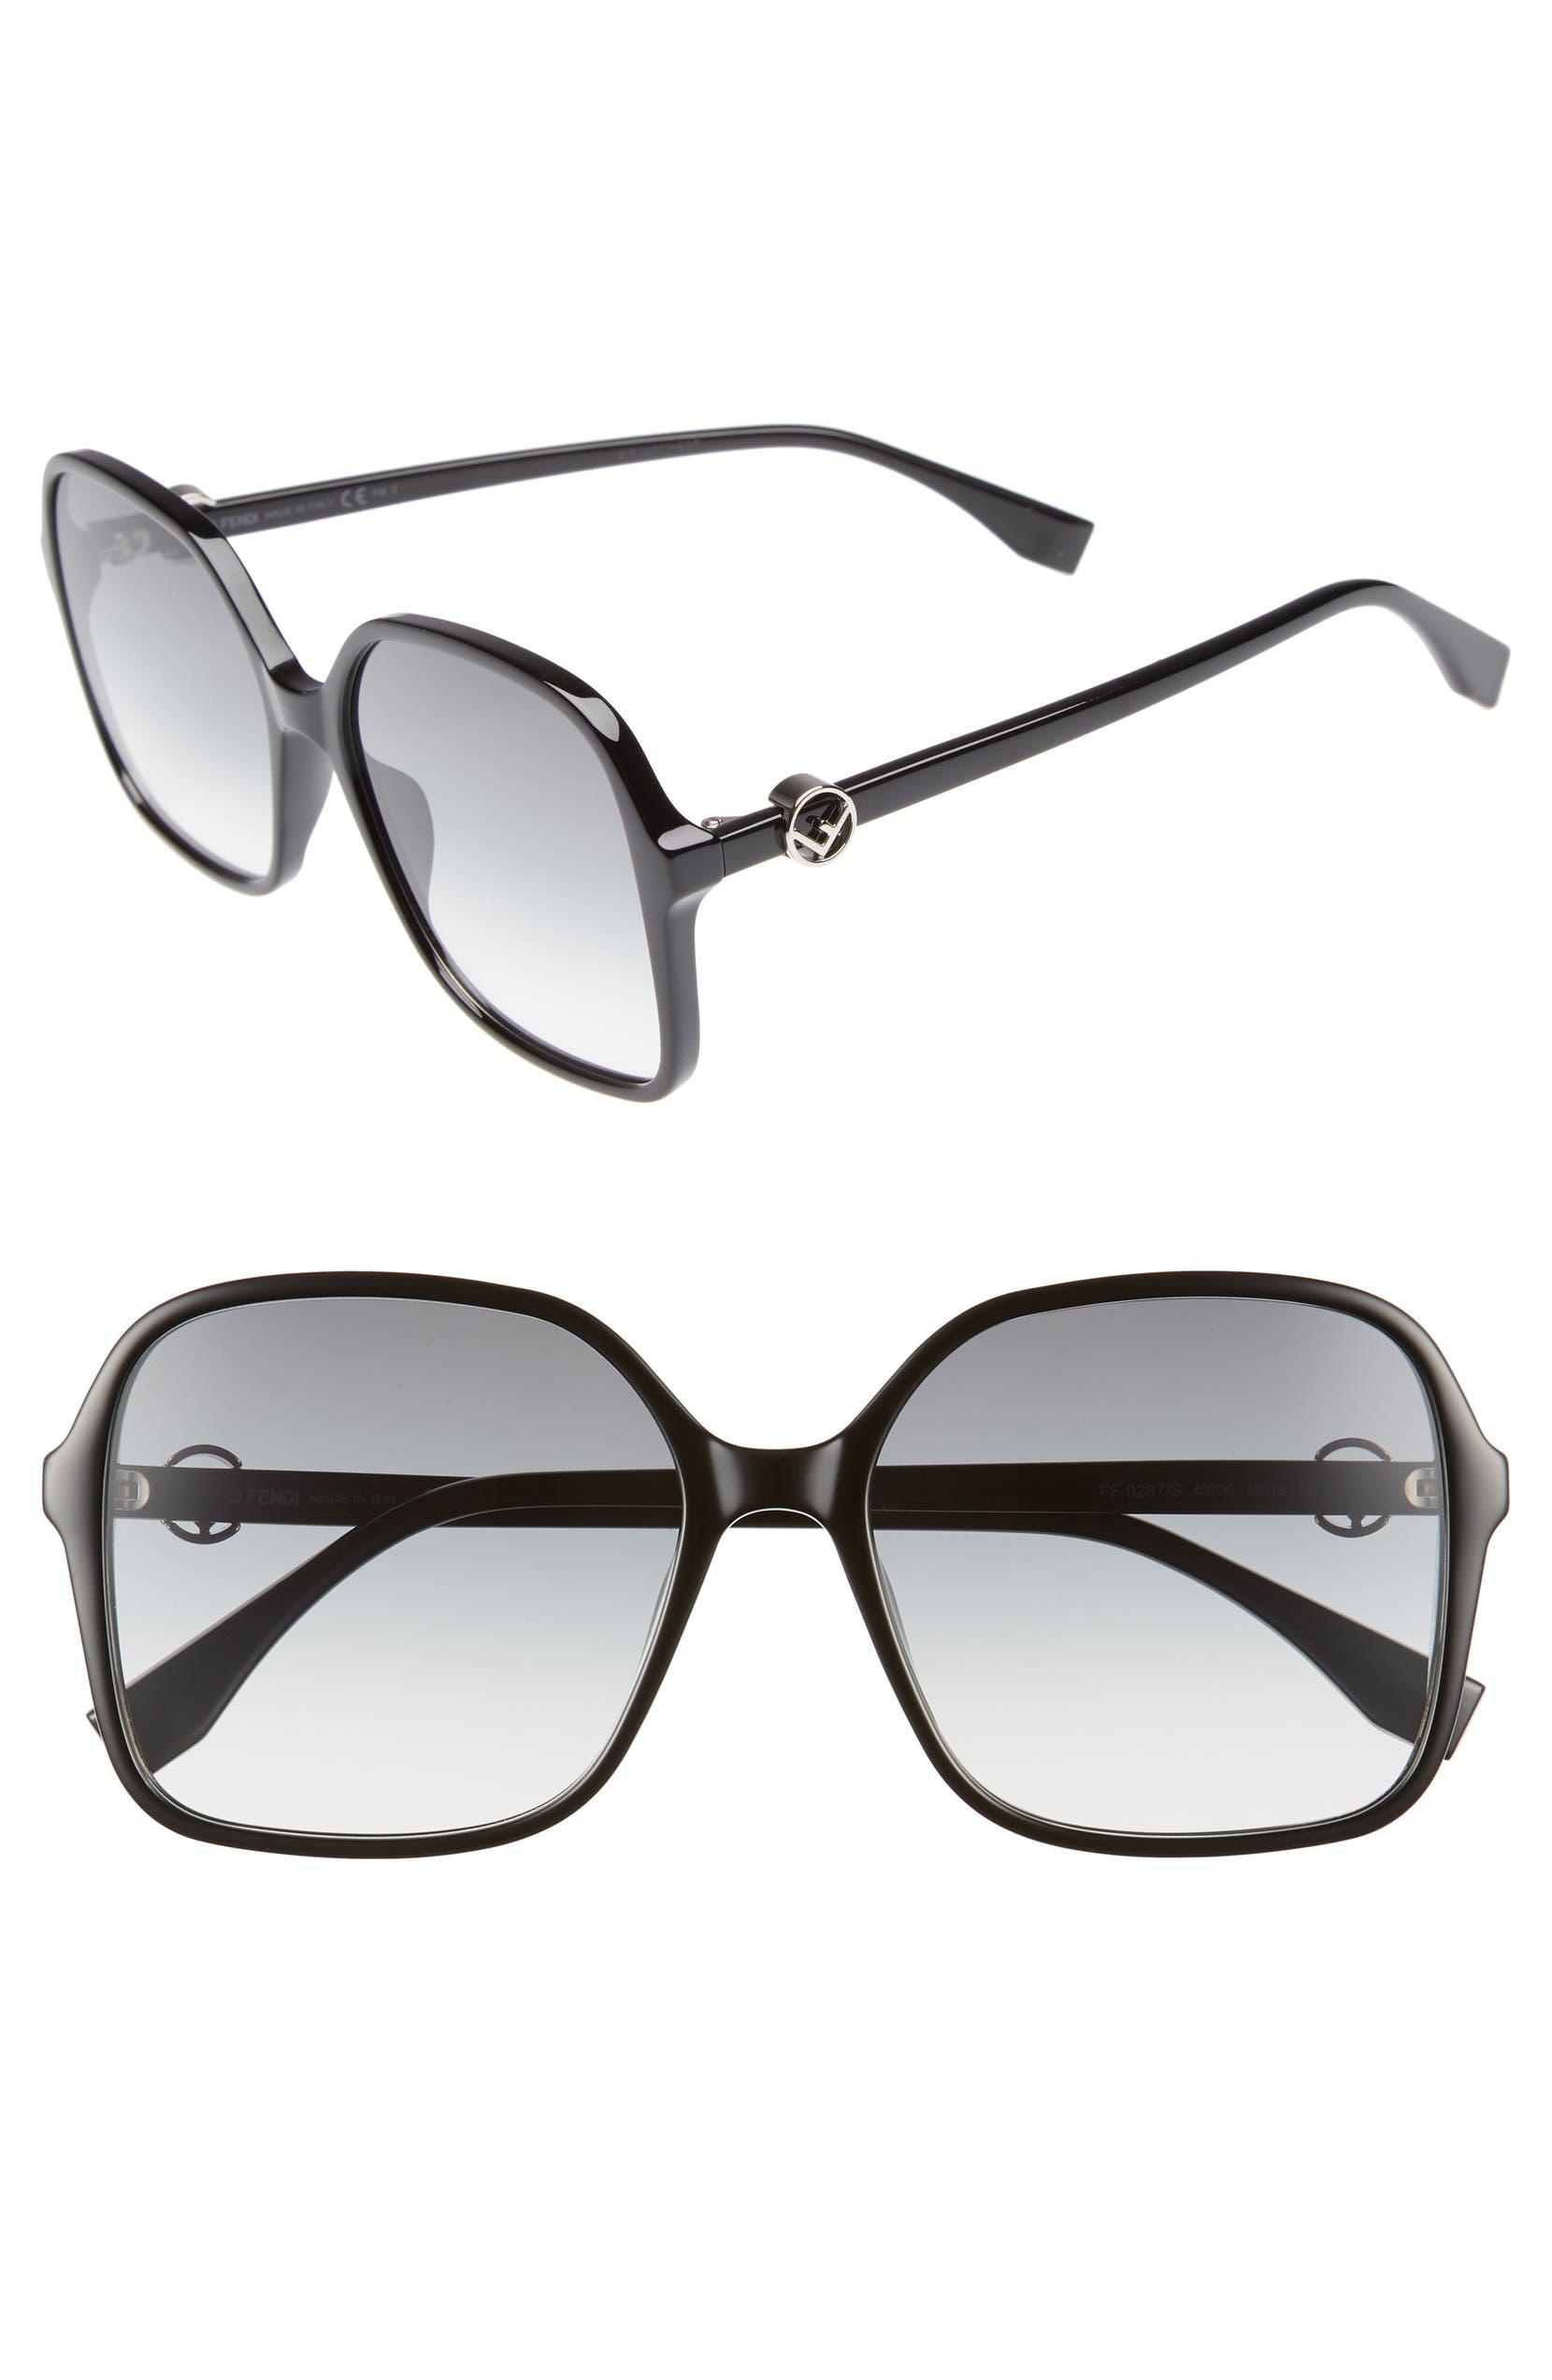 982791a4291 Fendi 58mm Square Sunglasses